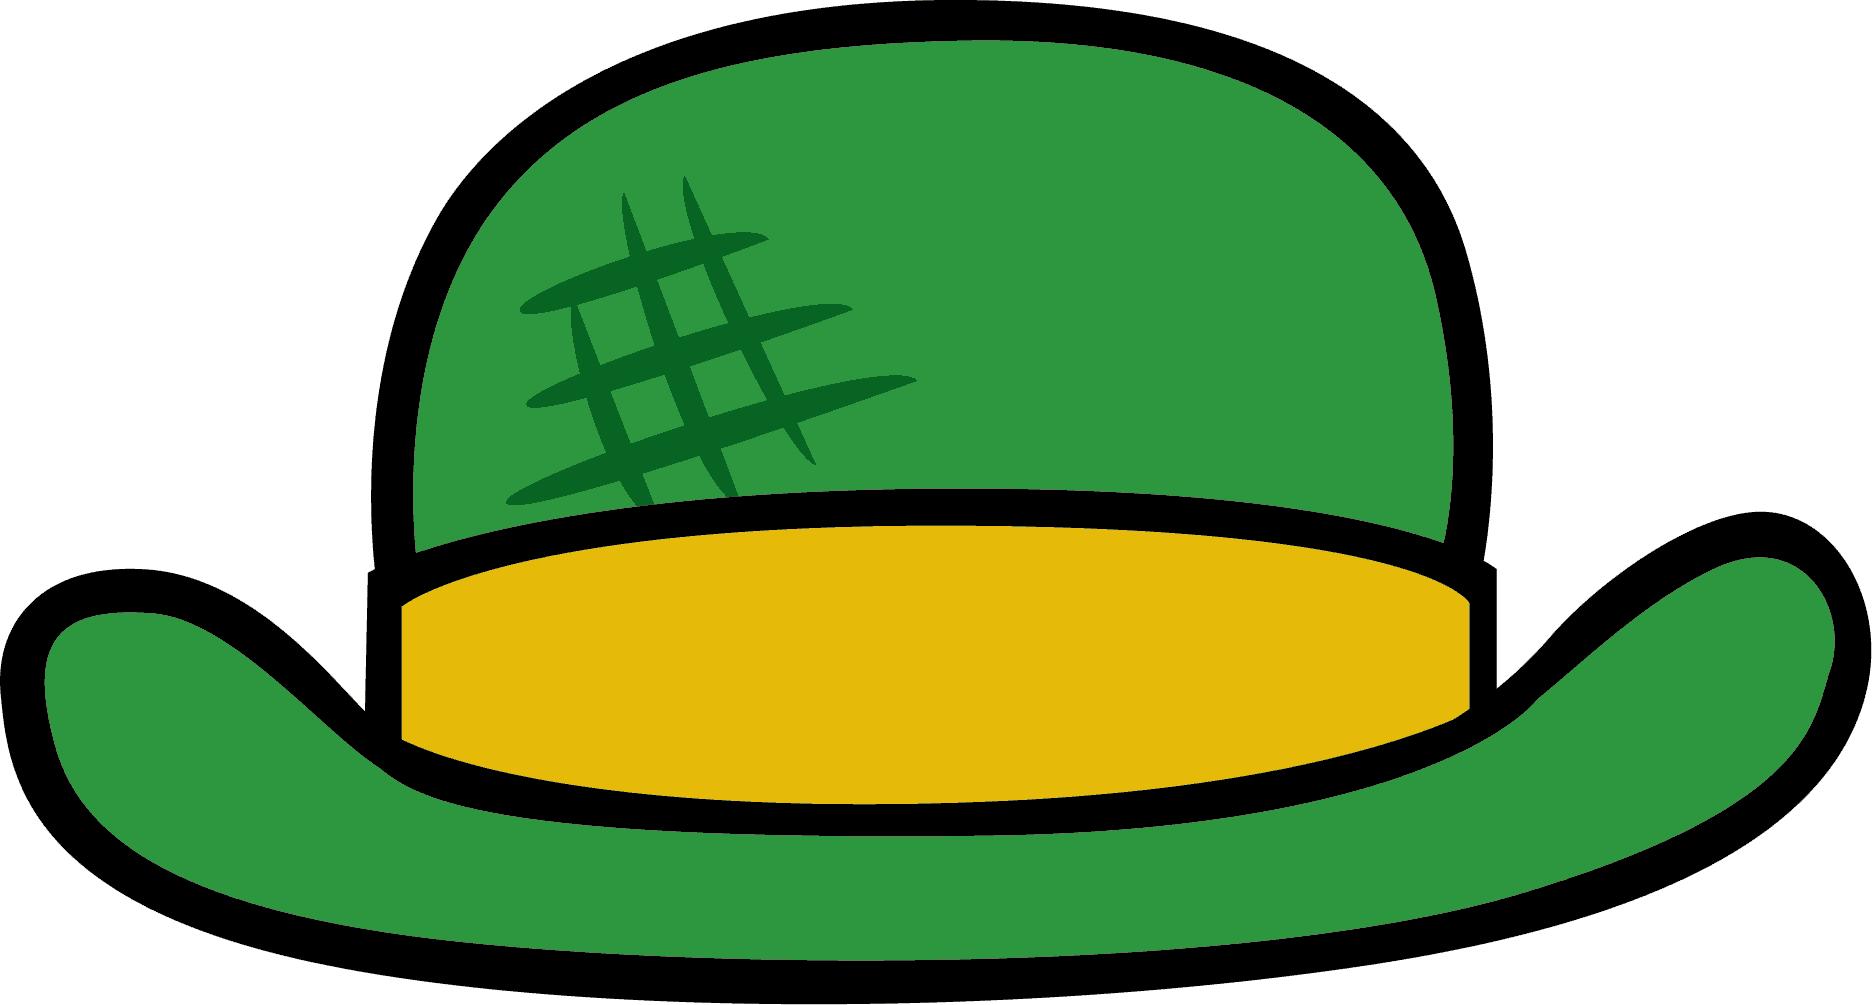 Pice clipart hat Free Clip clipart 2 clip